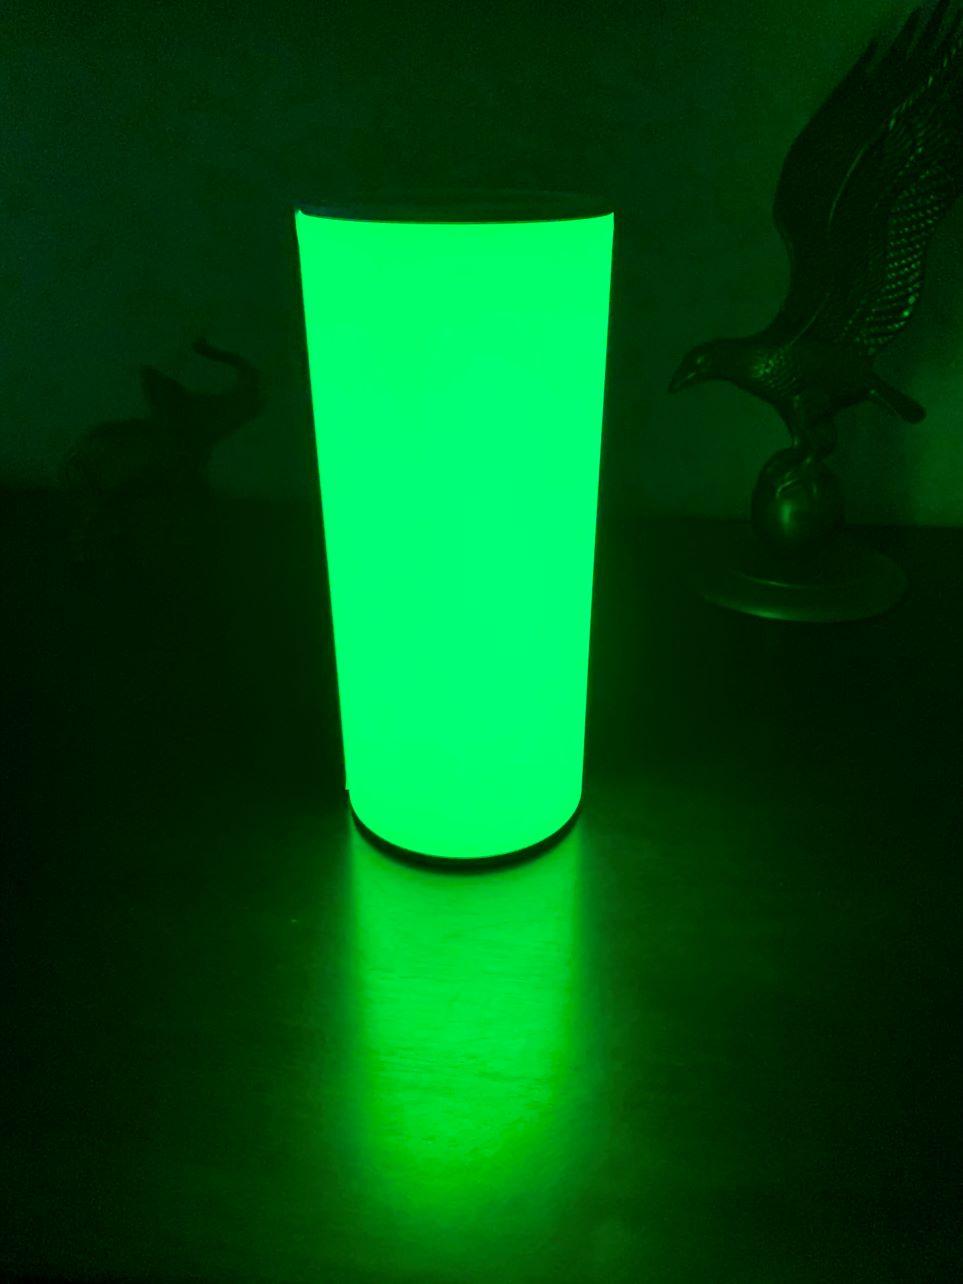 Allay green light lamp for headache/migraine help